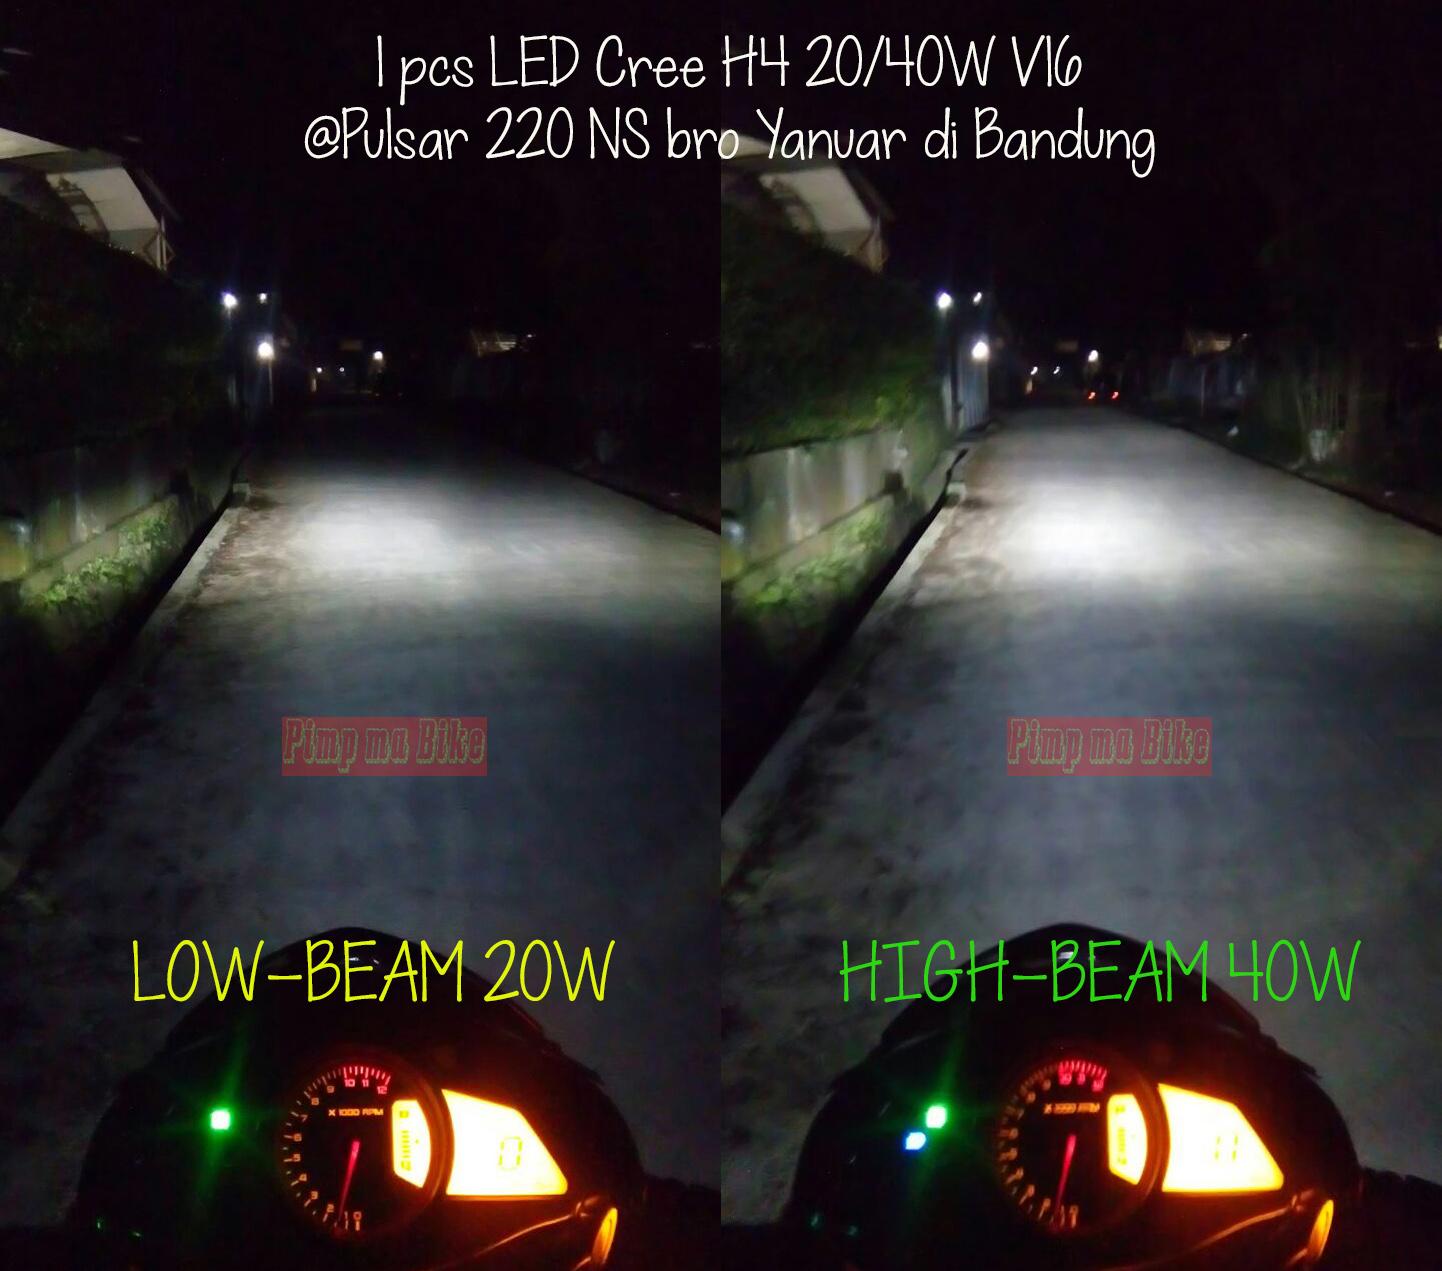 Lampu Utama LED Cree H4ampH7 V16 TURBO Tampil Stylish